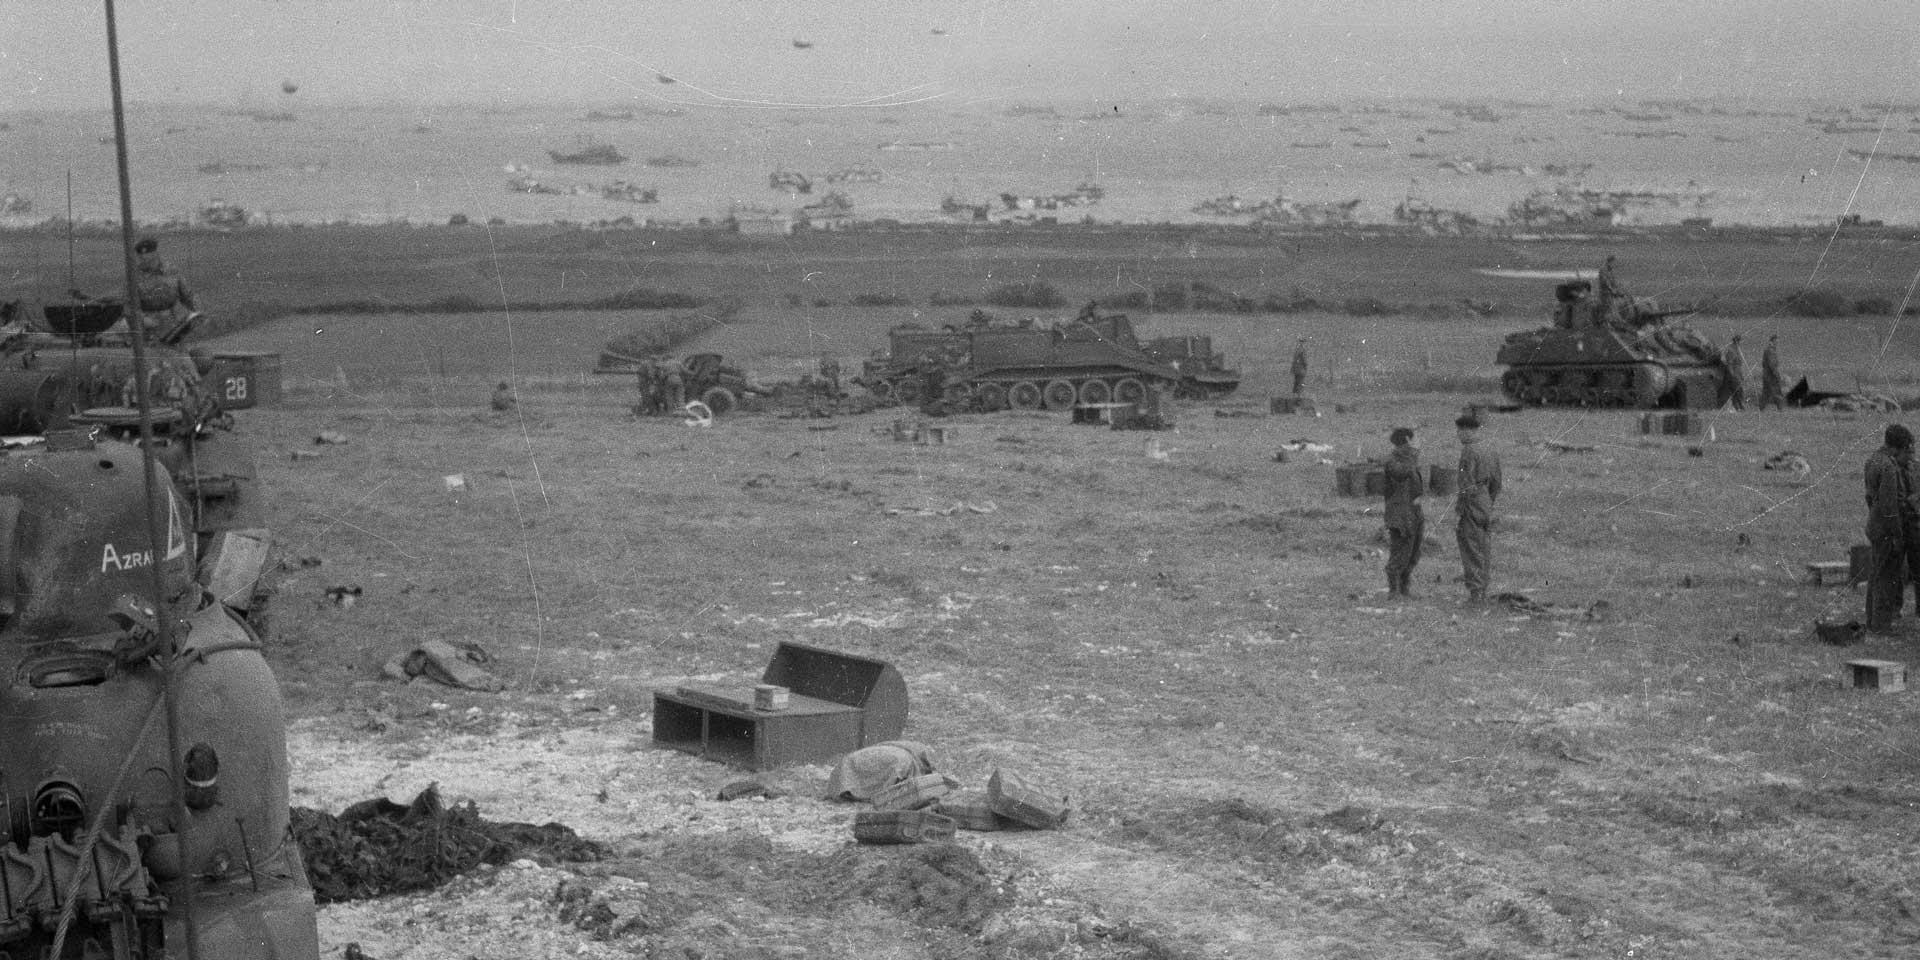 Tanks on King Beach, Gold Beach, 6 June 1944